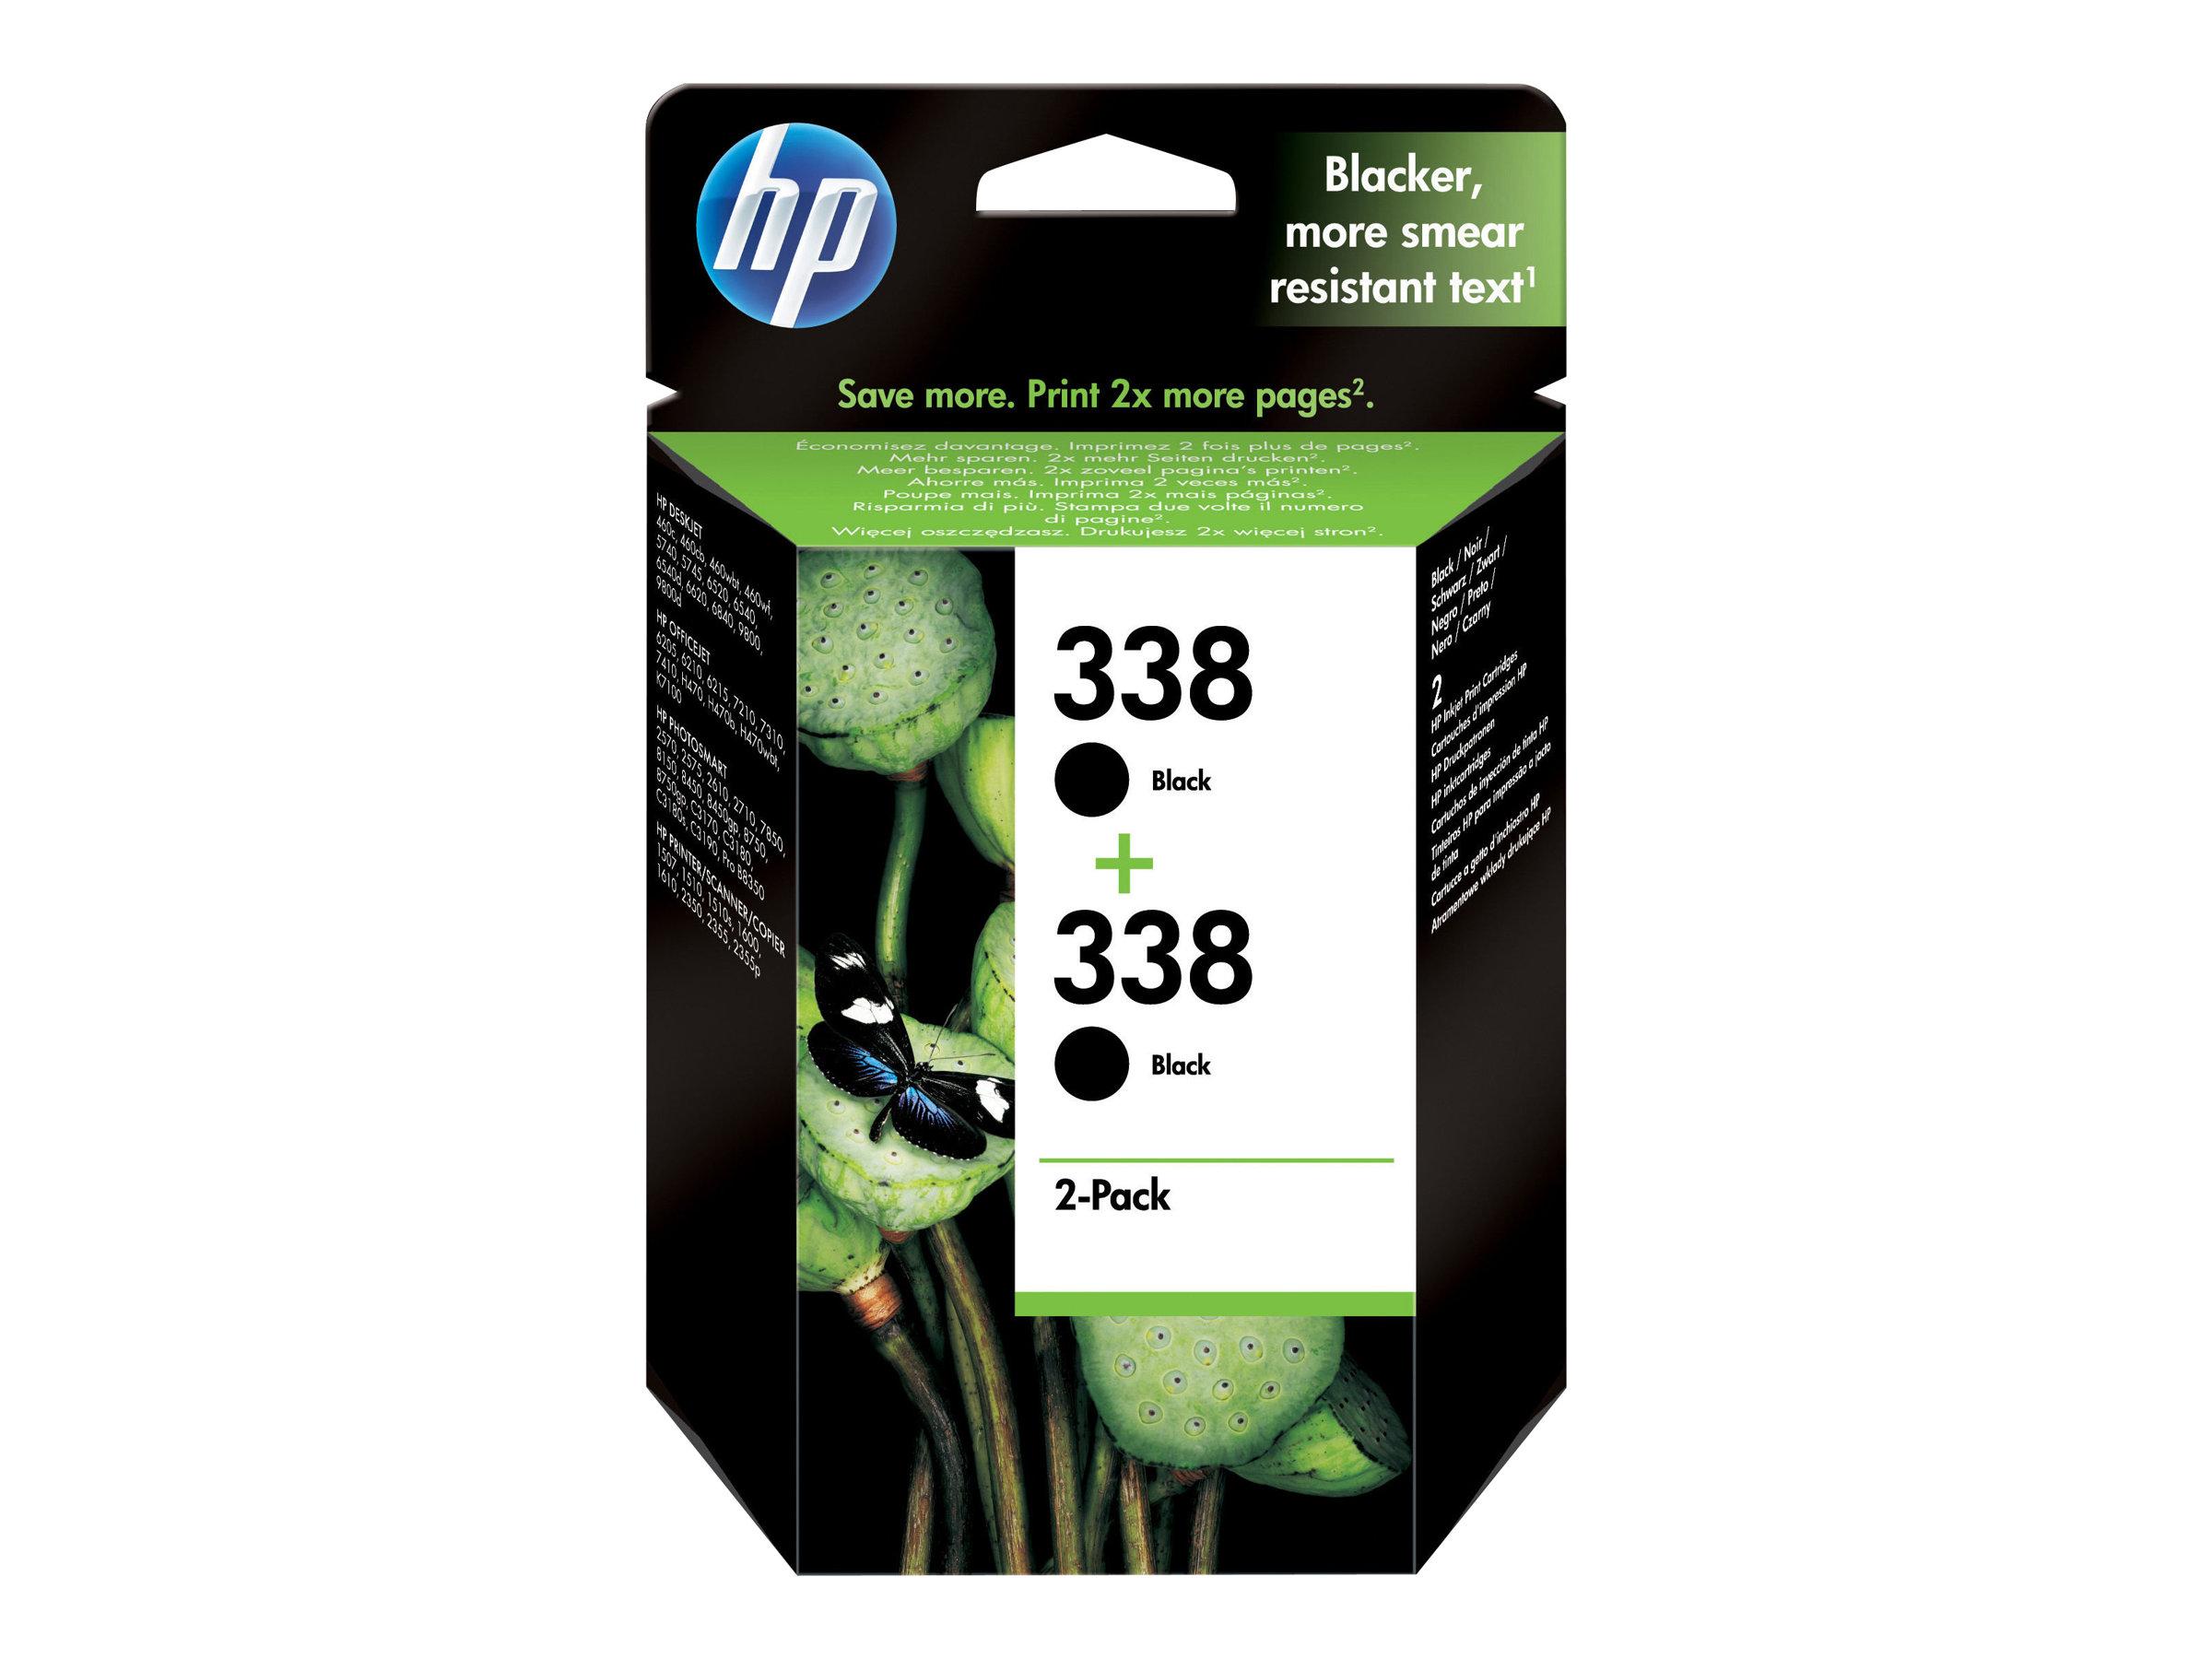 HP Tinte black Nr. 338 (CB331EE) ca. 480 Seiten, Doppelpack